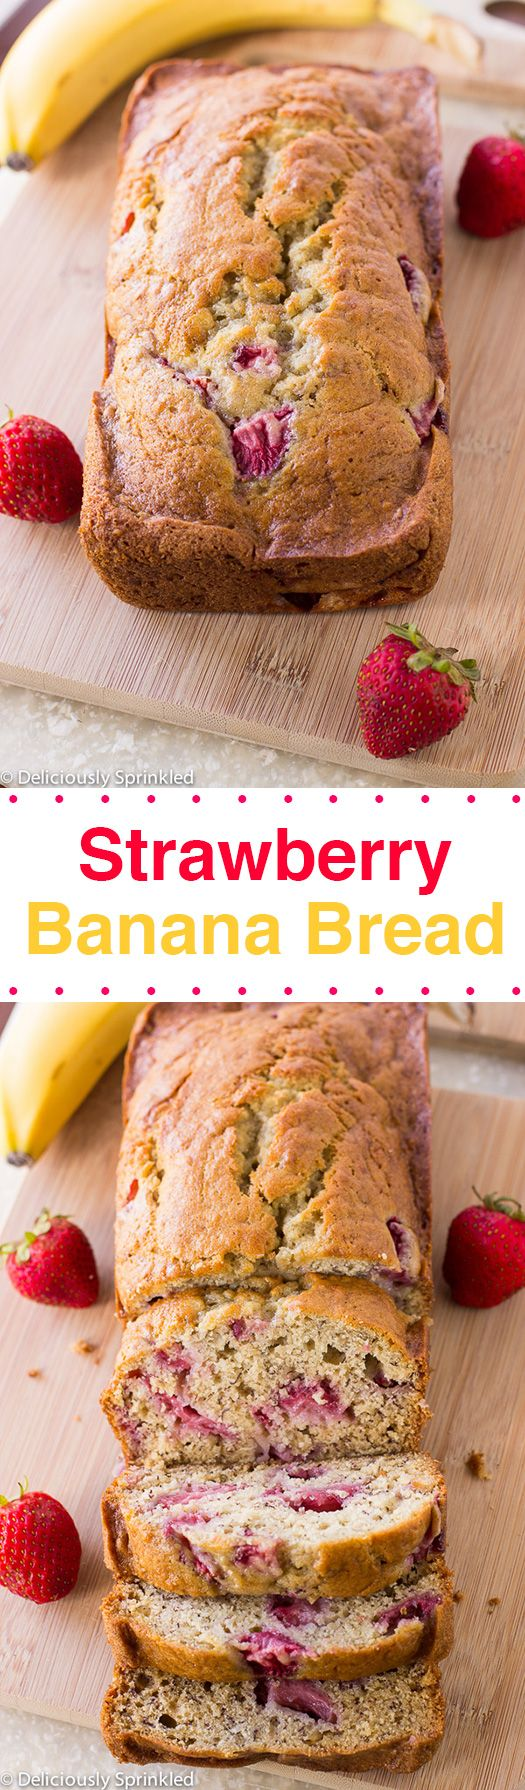 The BEST Strawberry Banana Bread